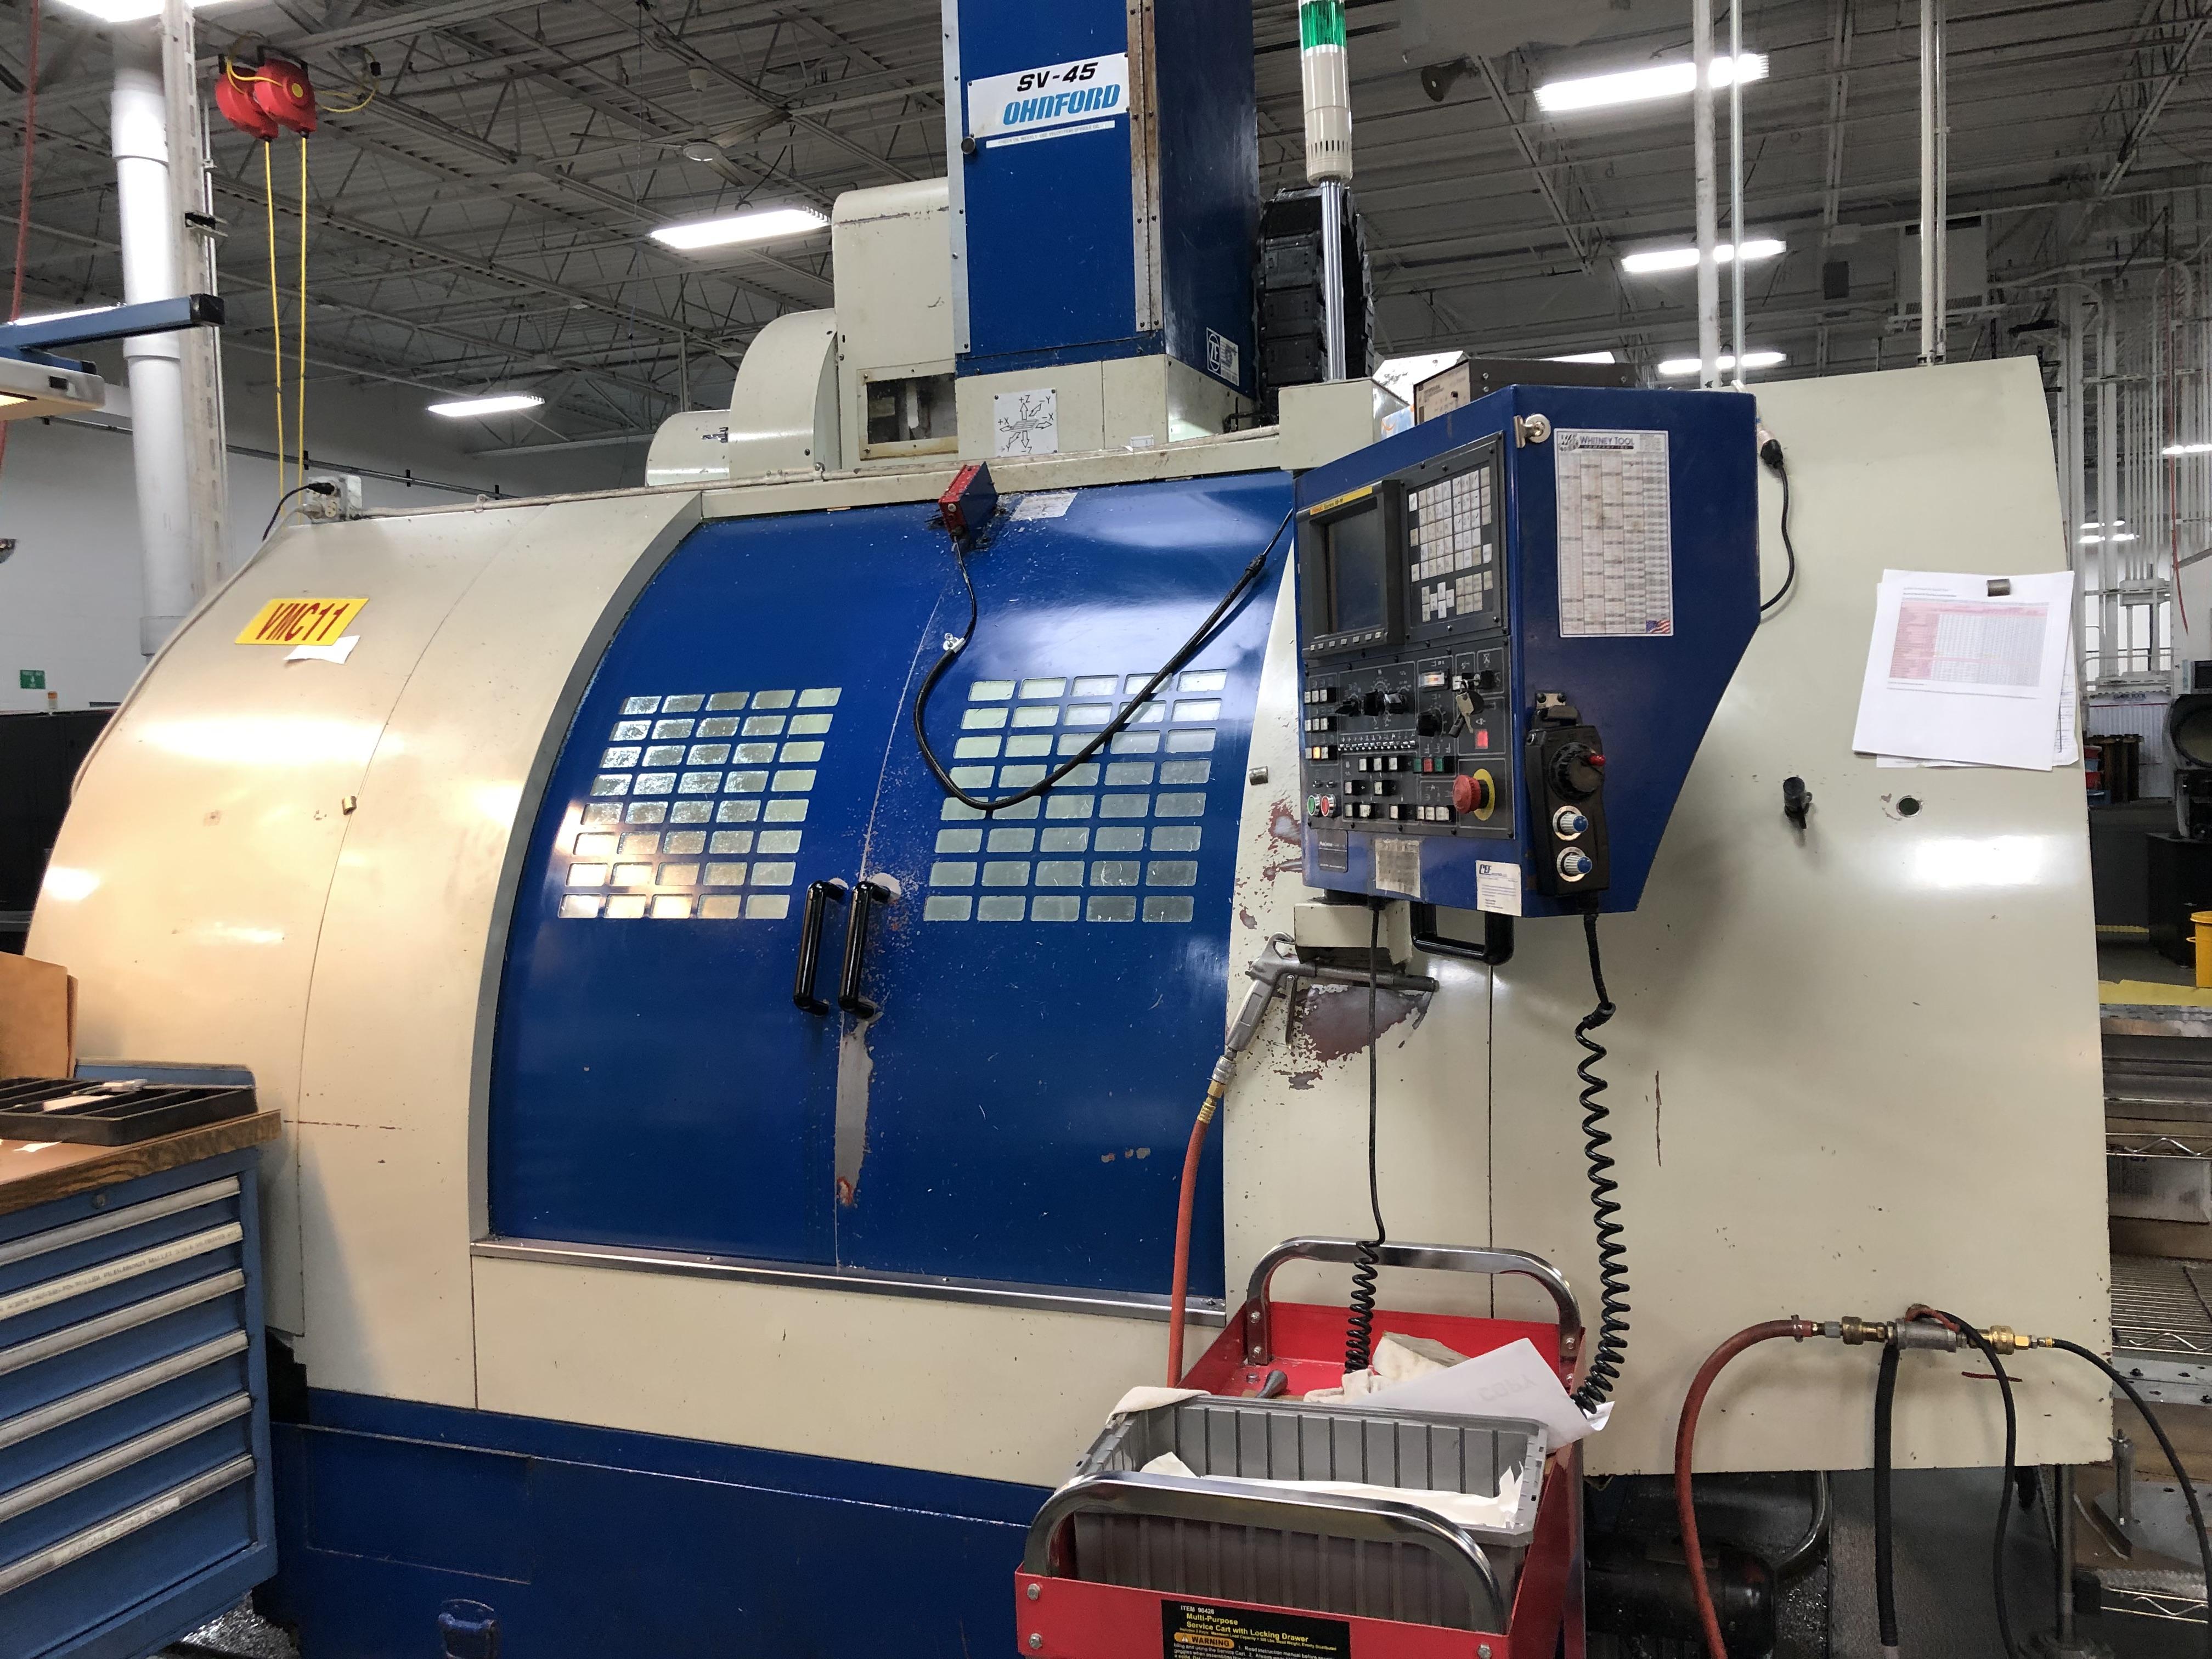 Used Vertical Machining Center Johnford SV-45 2000